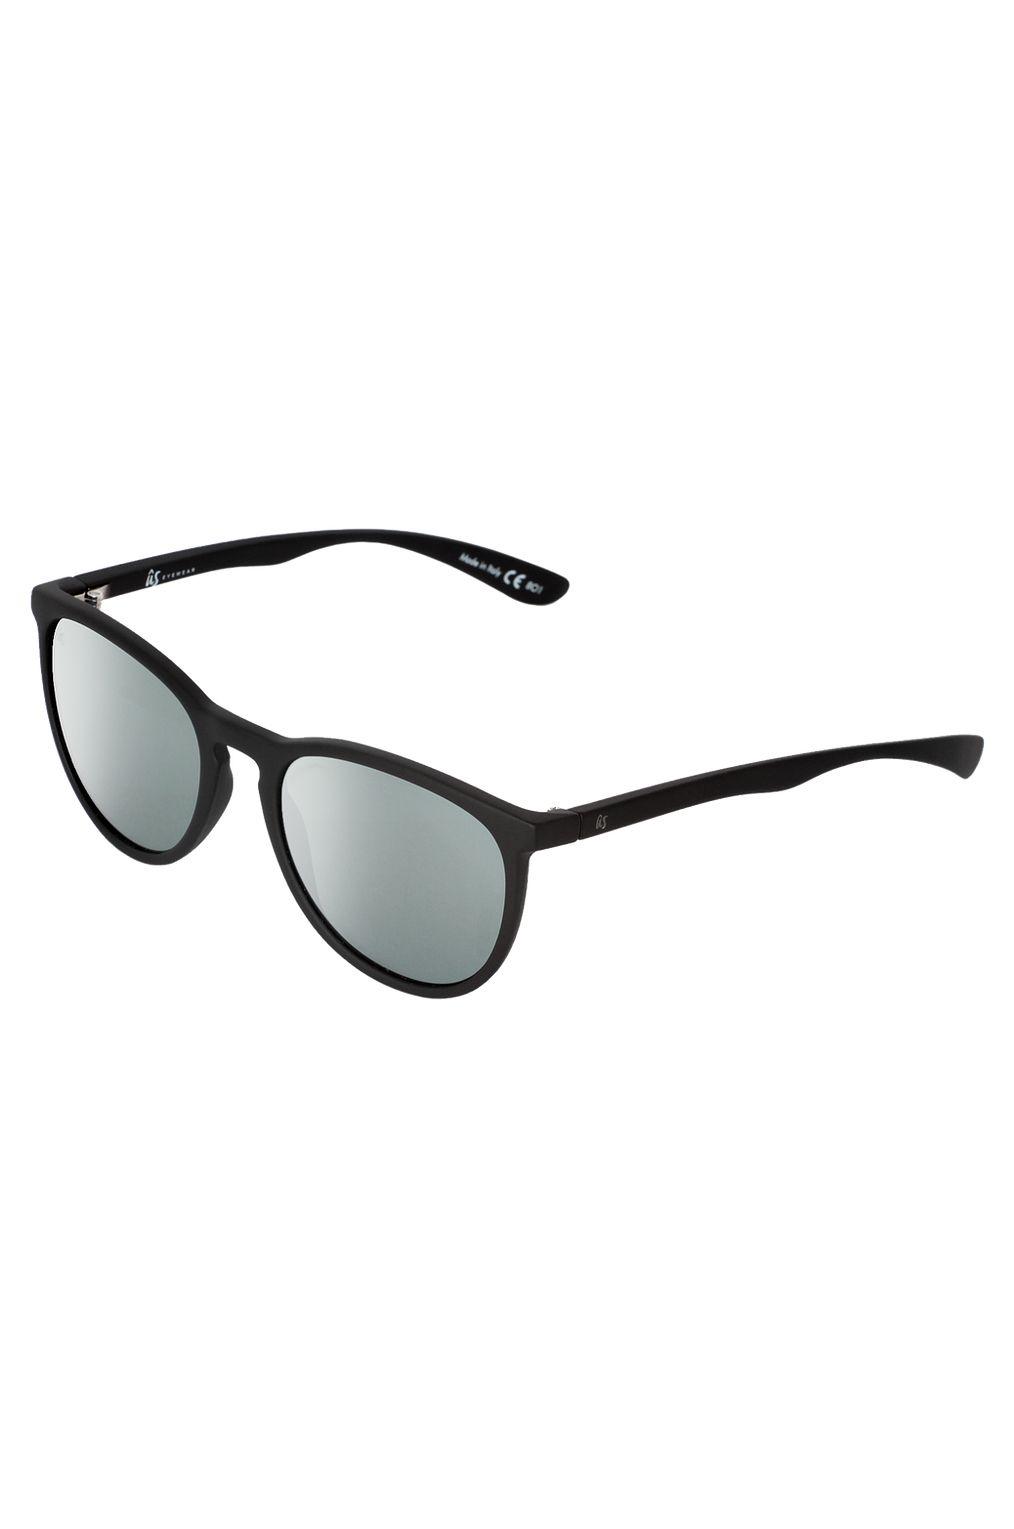 Oculos US NOBIS Matte Black/Vintage Grey Silver Chrome